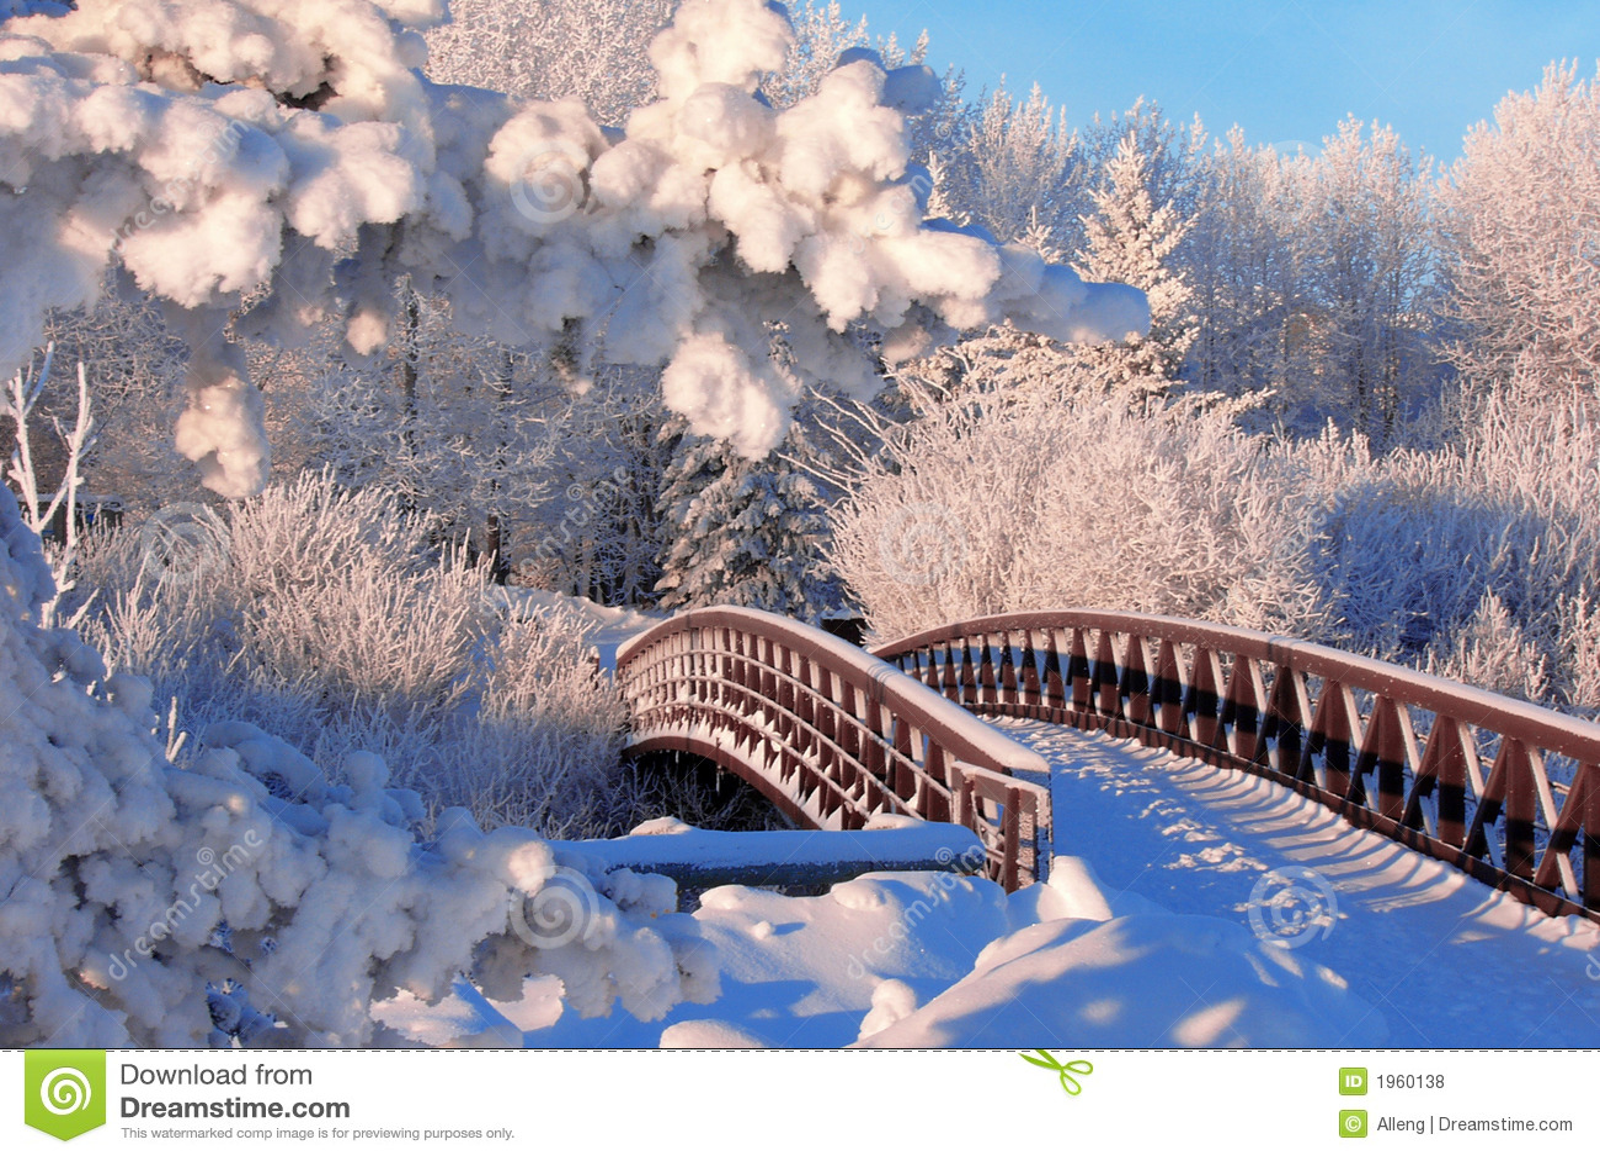 winter scenes wallpaper free download